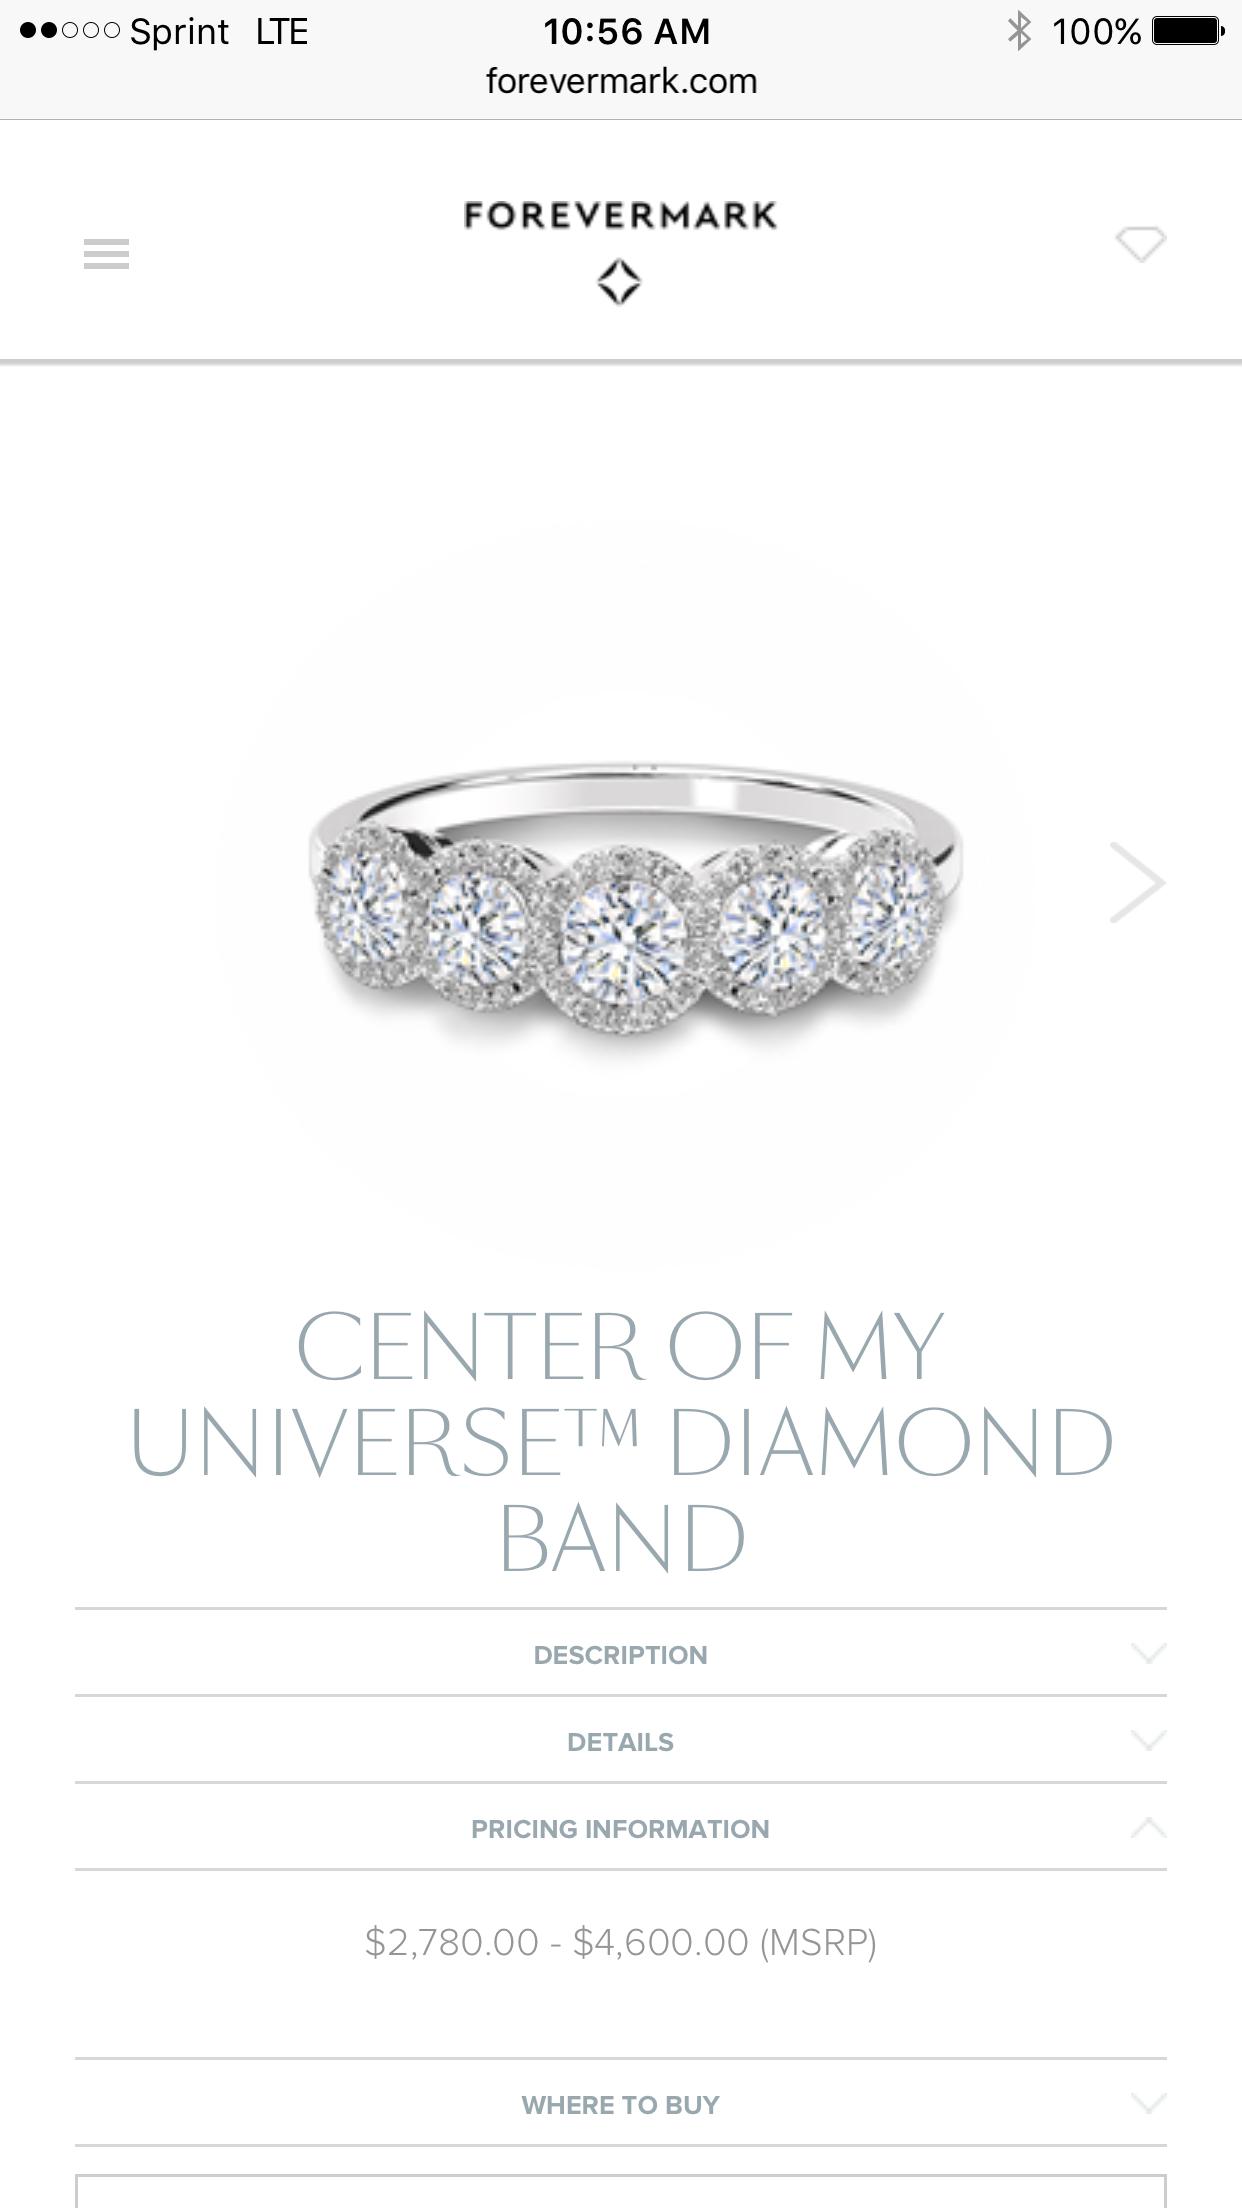 Forevermark Cwnter of My Universe Diamond Band-Anniversary Present??